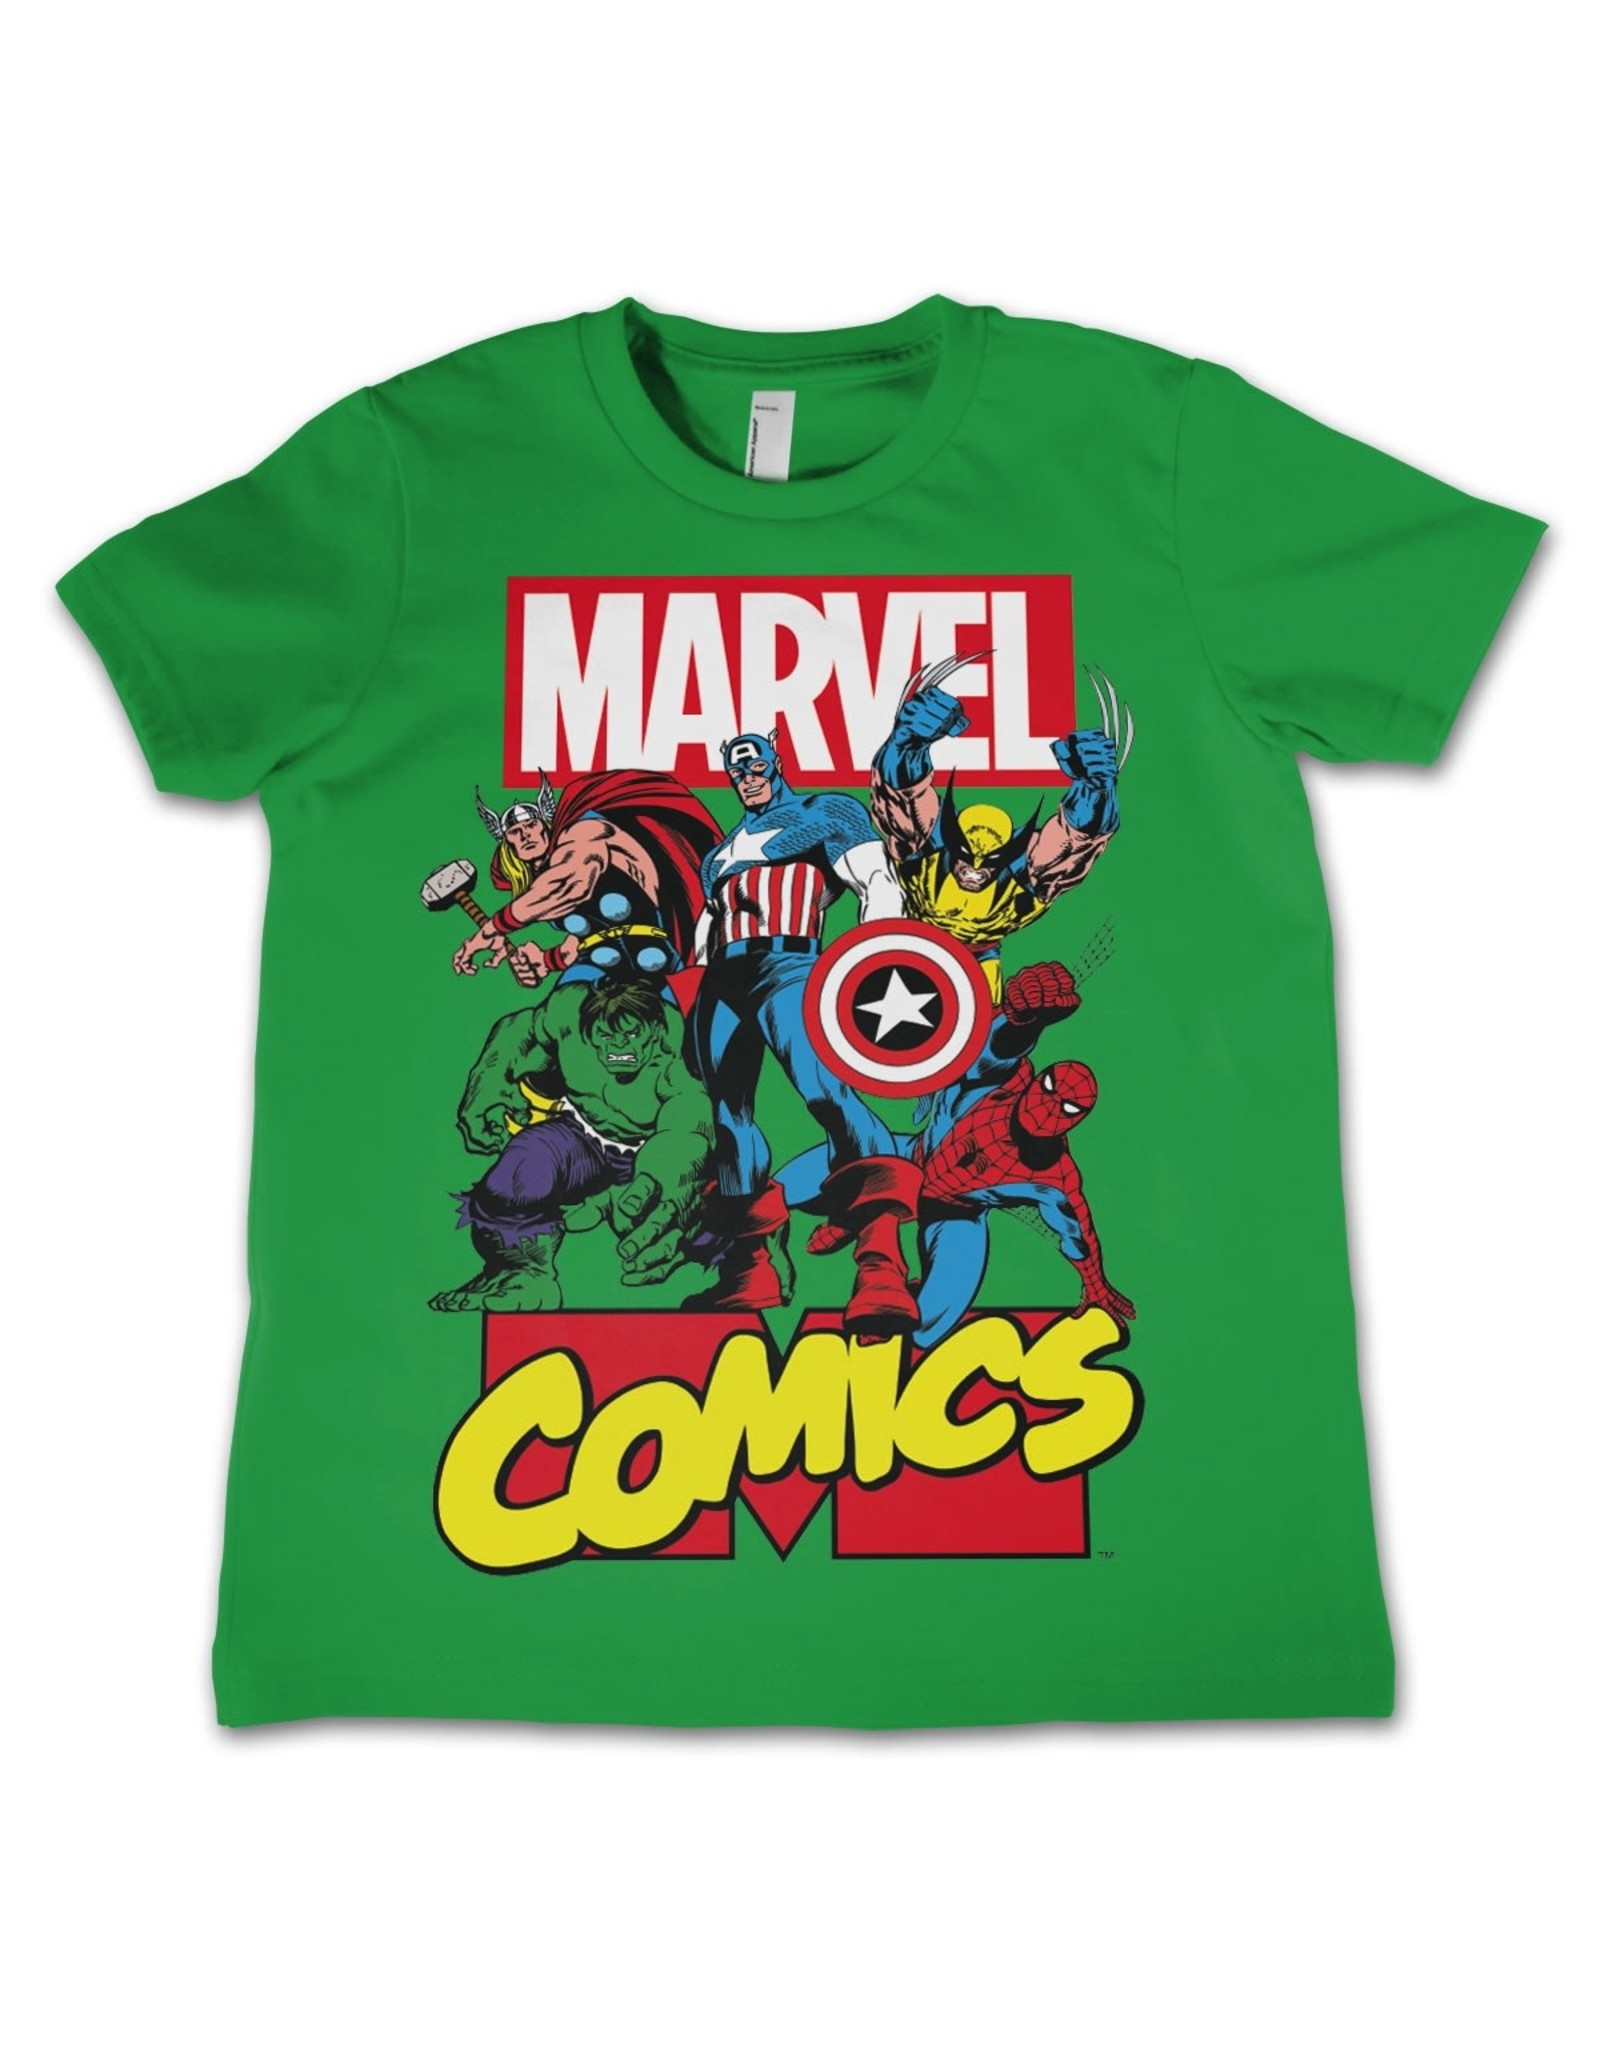 MARVEL COMICS - T-Shirt KIDS Comics Heroes - Green (4 Years)